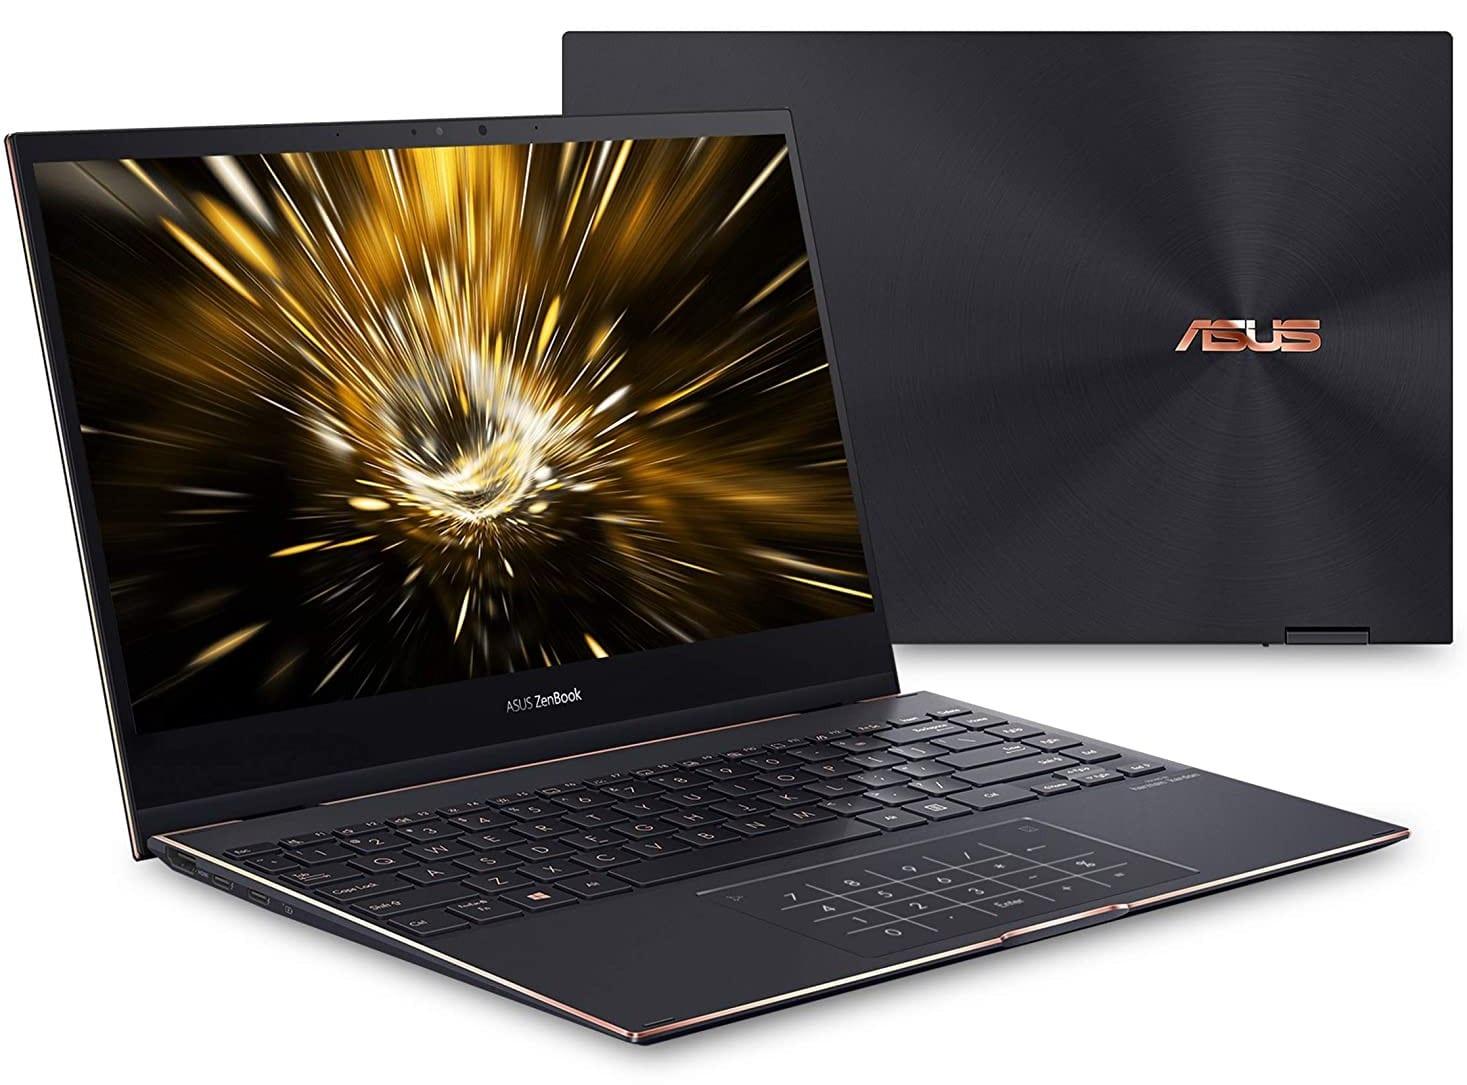 asus-oled-laptop